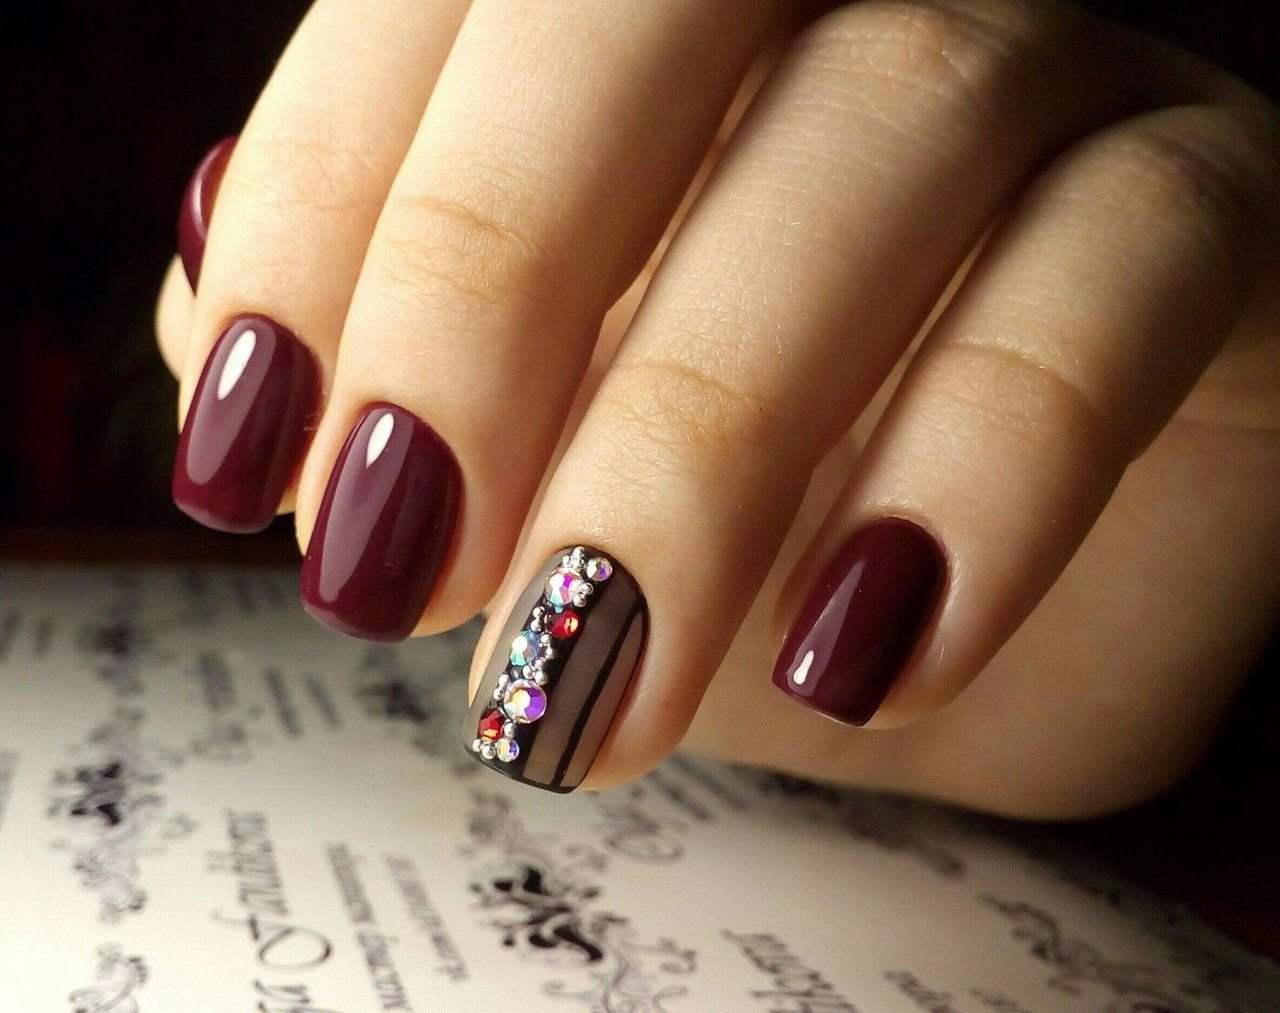 Elegant Nail Designs With Rhinestones Glamorous And Chic